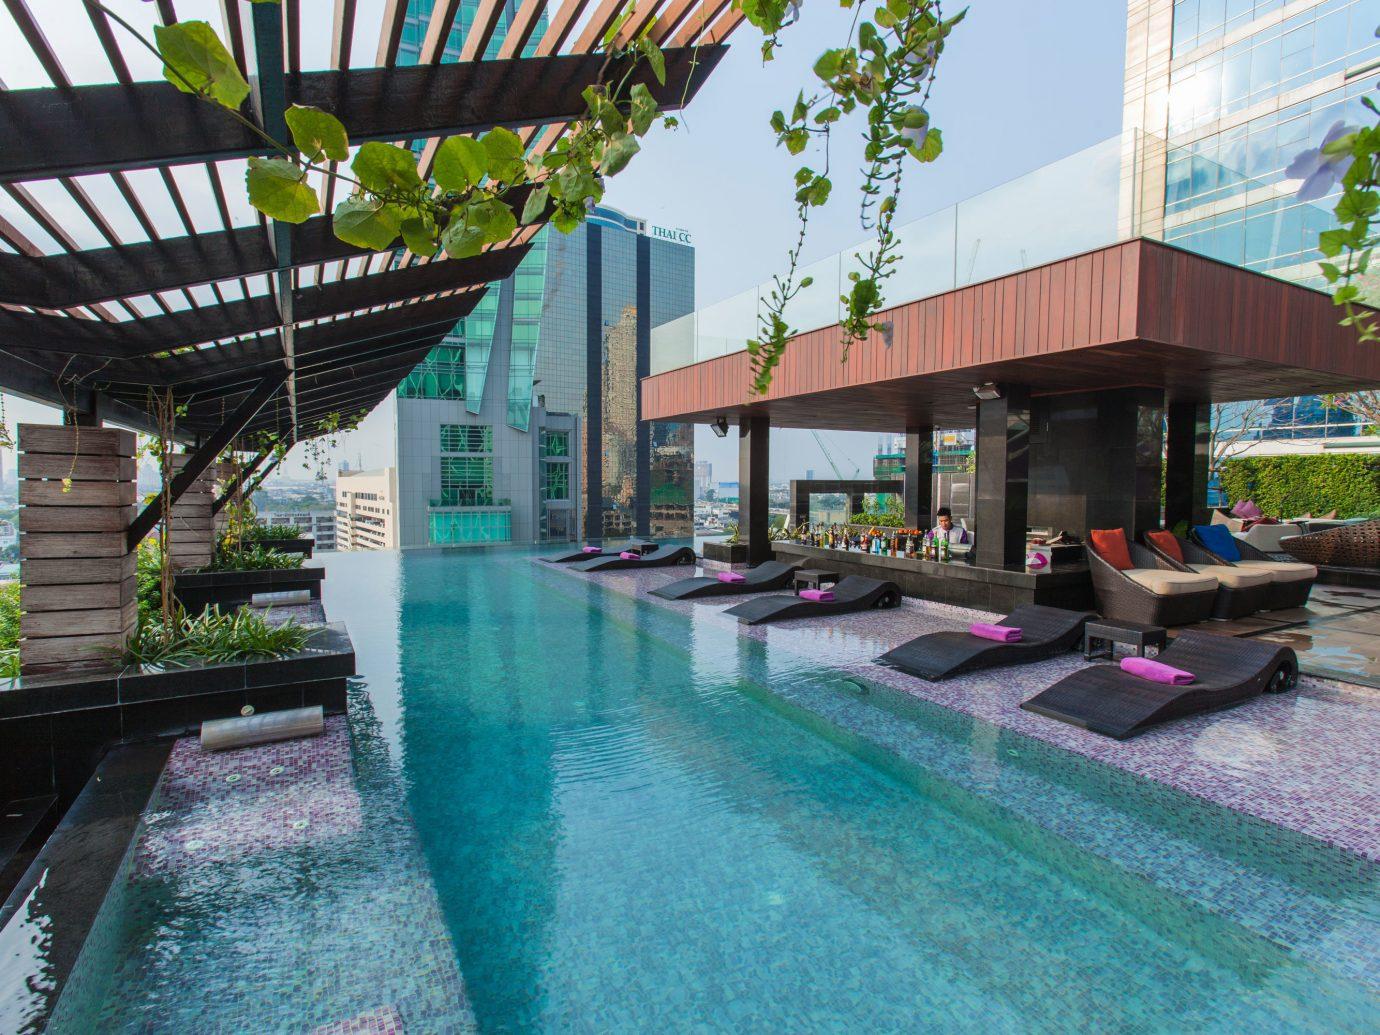 Trip Ideas outdoor leisure swimming pool condominium property Resort vacation estate real estate Water park Villa backyard